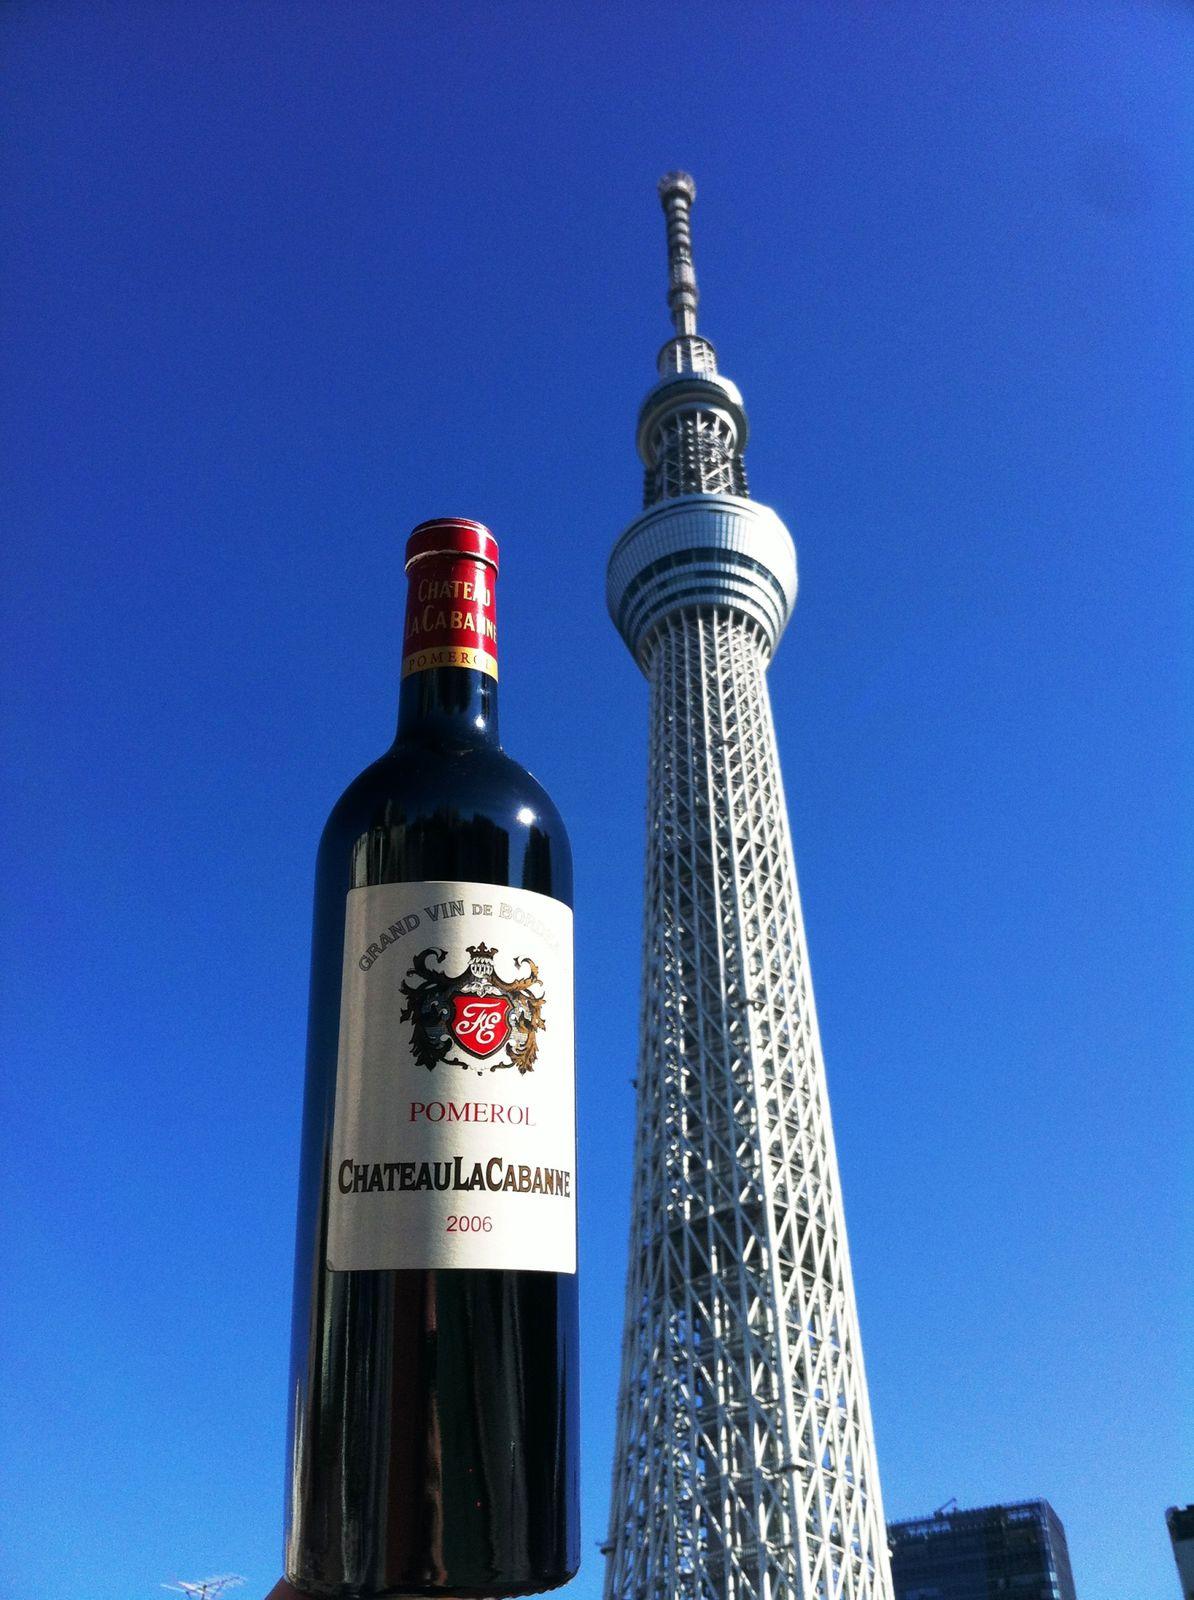 La Cabanne in Tokyo (Sky Tree Tower) - Japan